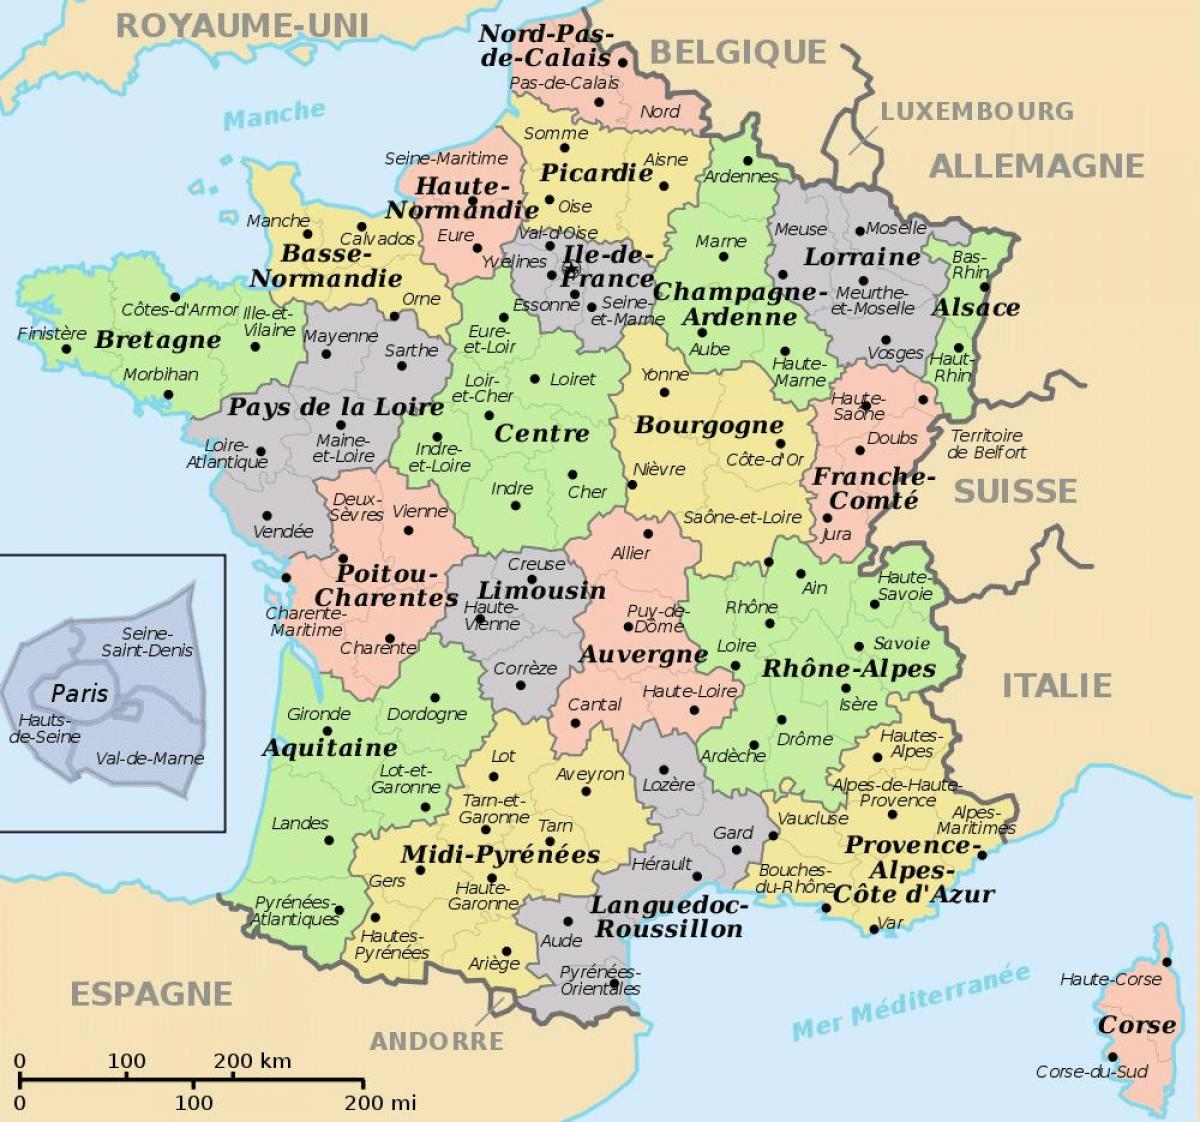 kart frankrike regioner Regioner i Frankrike kart   Kart over Frankrike og regioner (Vest  kart frankrike regioner